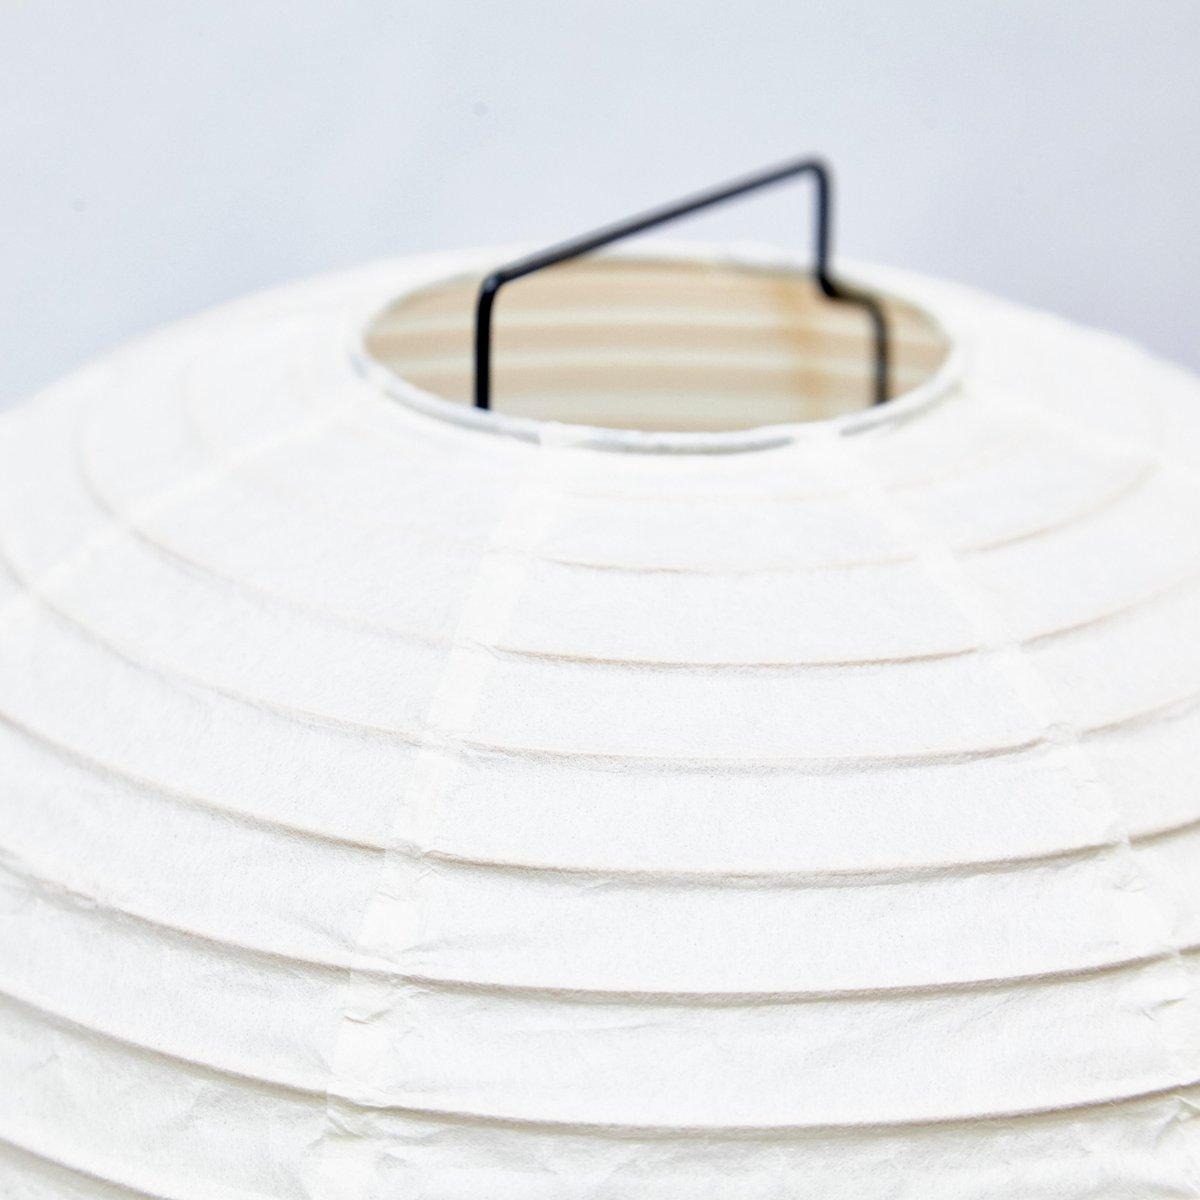 24n Floor Lamp By Isamu Noguchi For Ozeki Company Ltd 1980s For Sale At Pamono